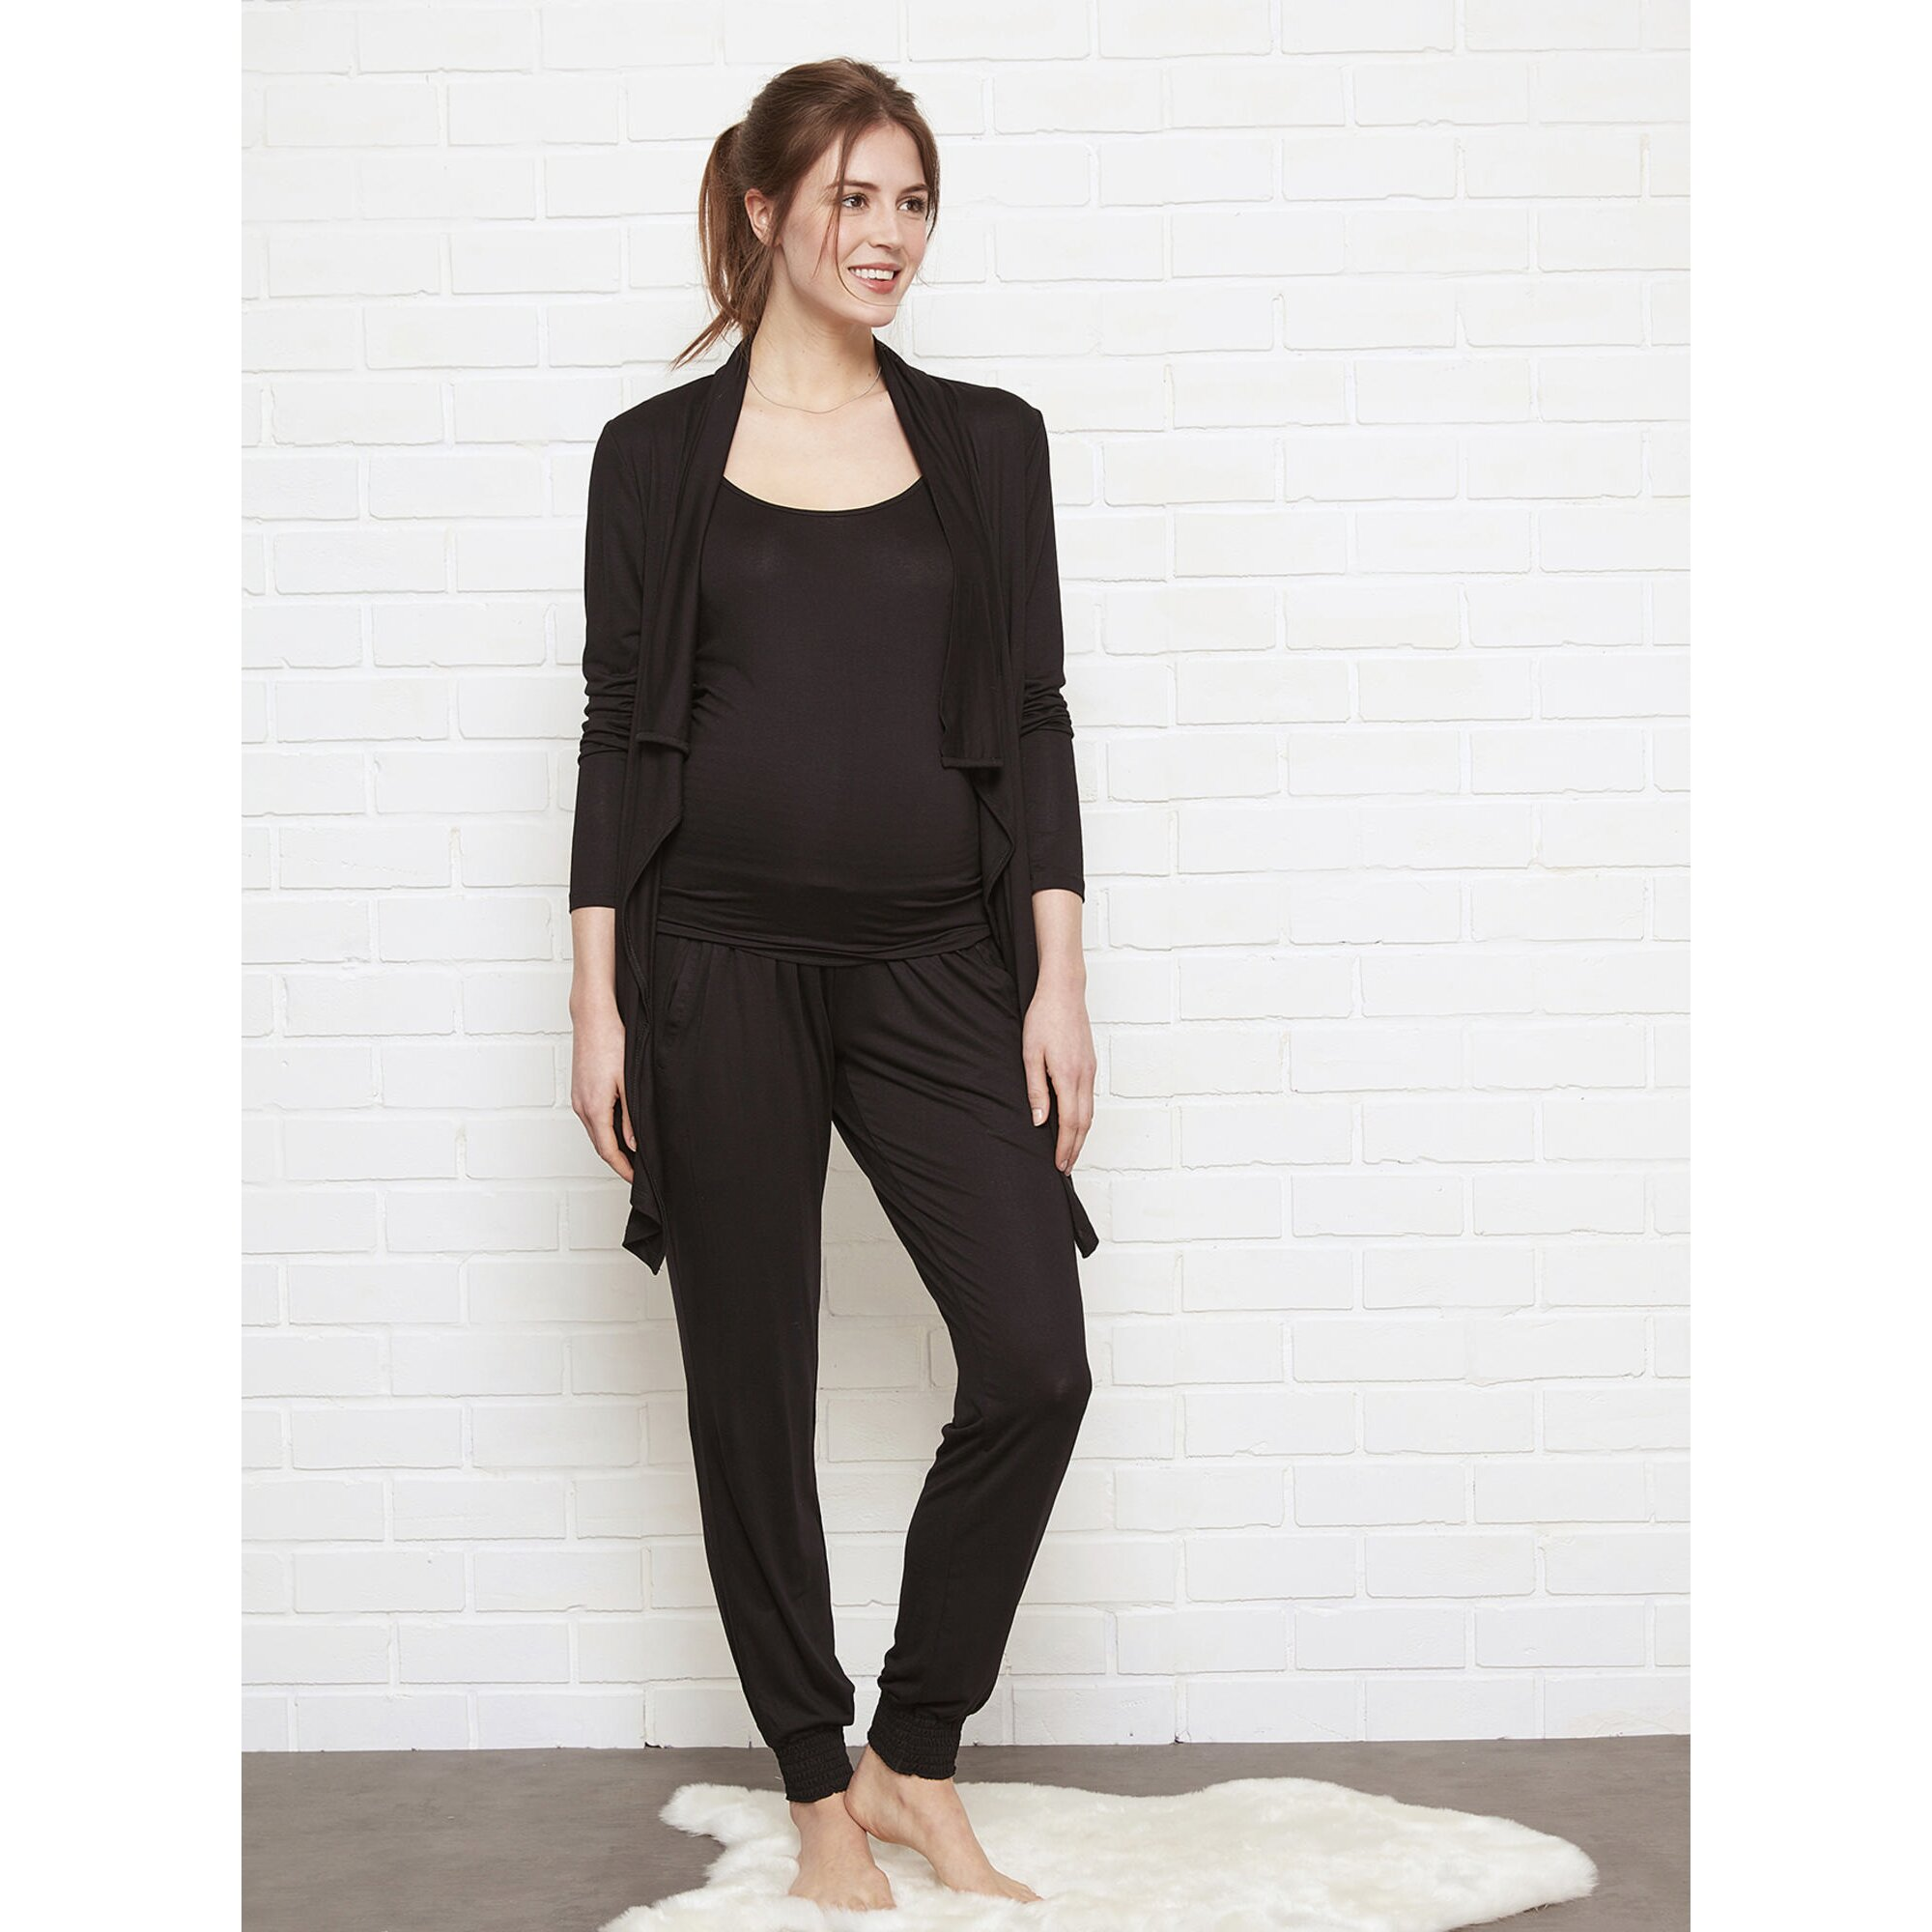 vertbaudet-homewear-set-schwangerschaft-und-stillzeit, 50.99 EUR @ babywalz-de